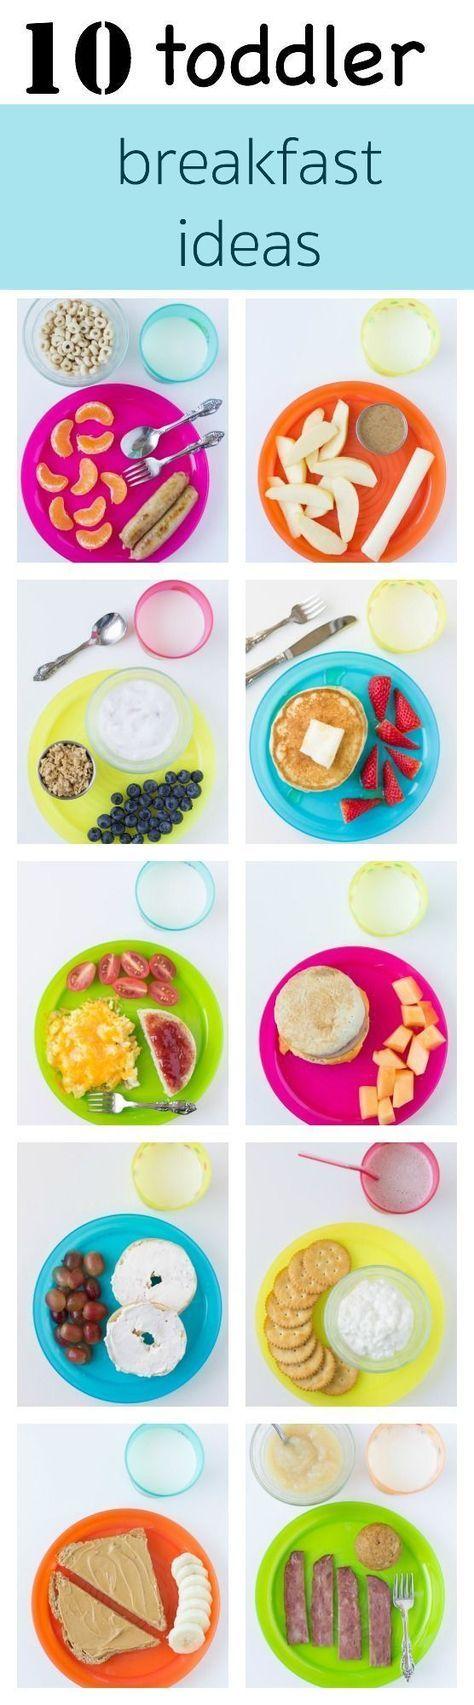 10 toddler breakfast recipes  recipe  toddler breakfast